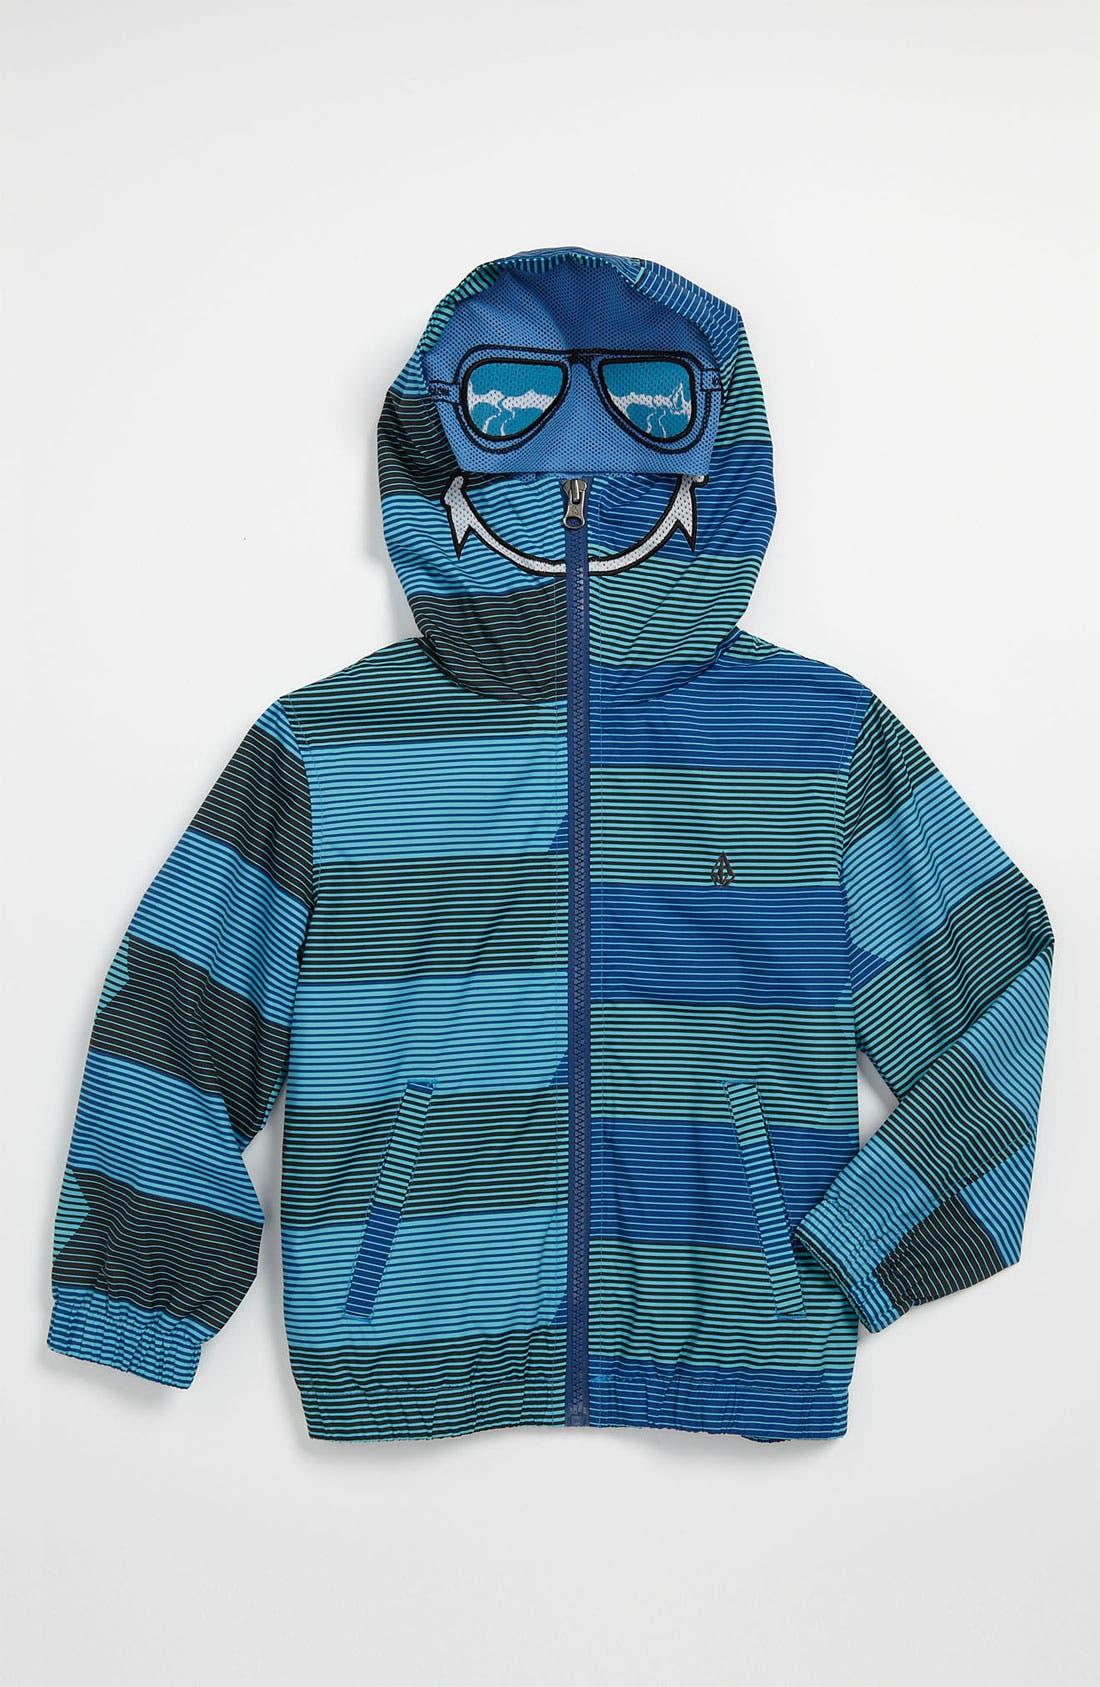 Alternate Image 1 Selected - Volcom 'Sonrisa' Jacket (Toddler)